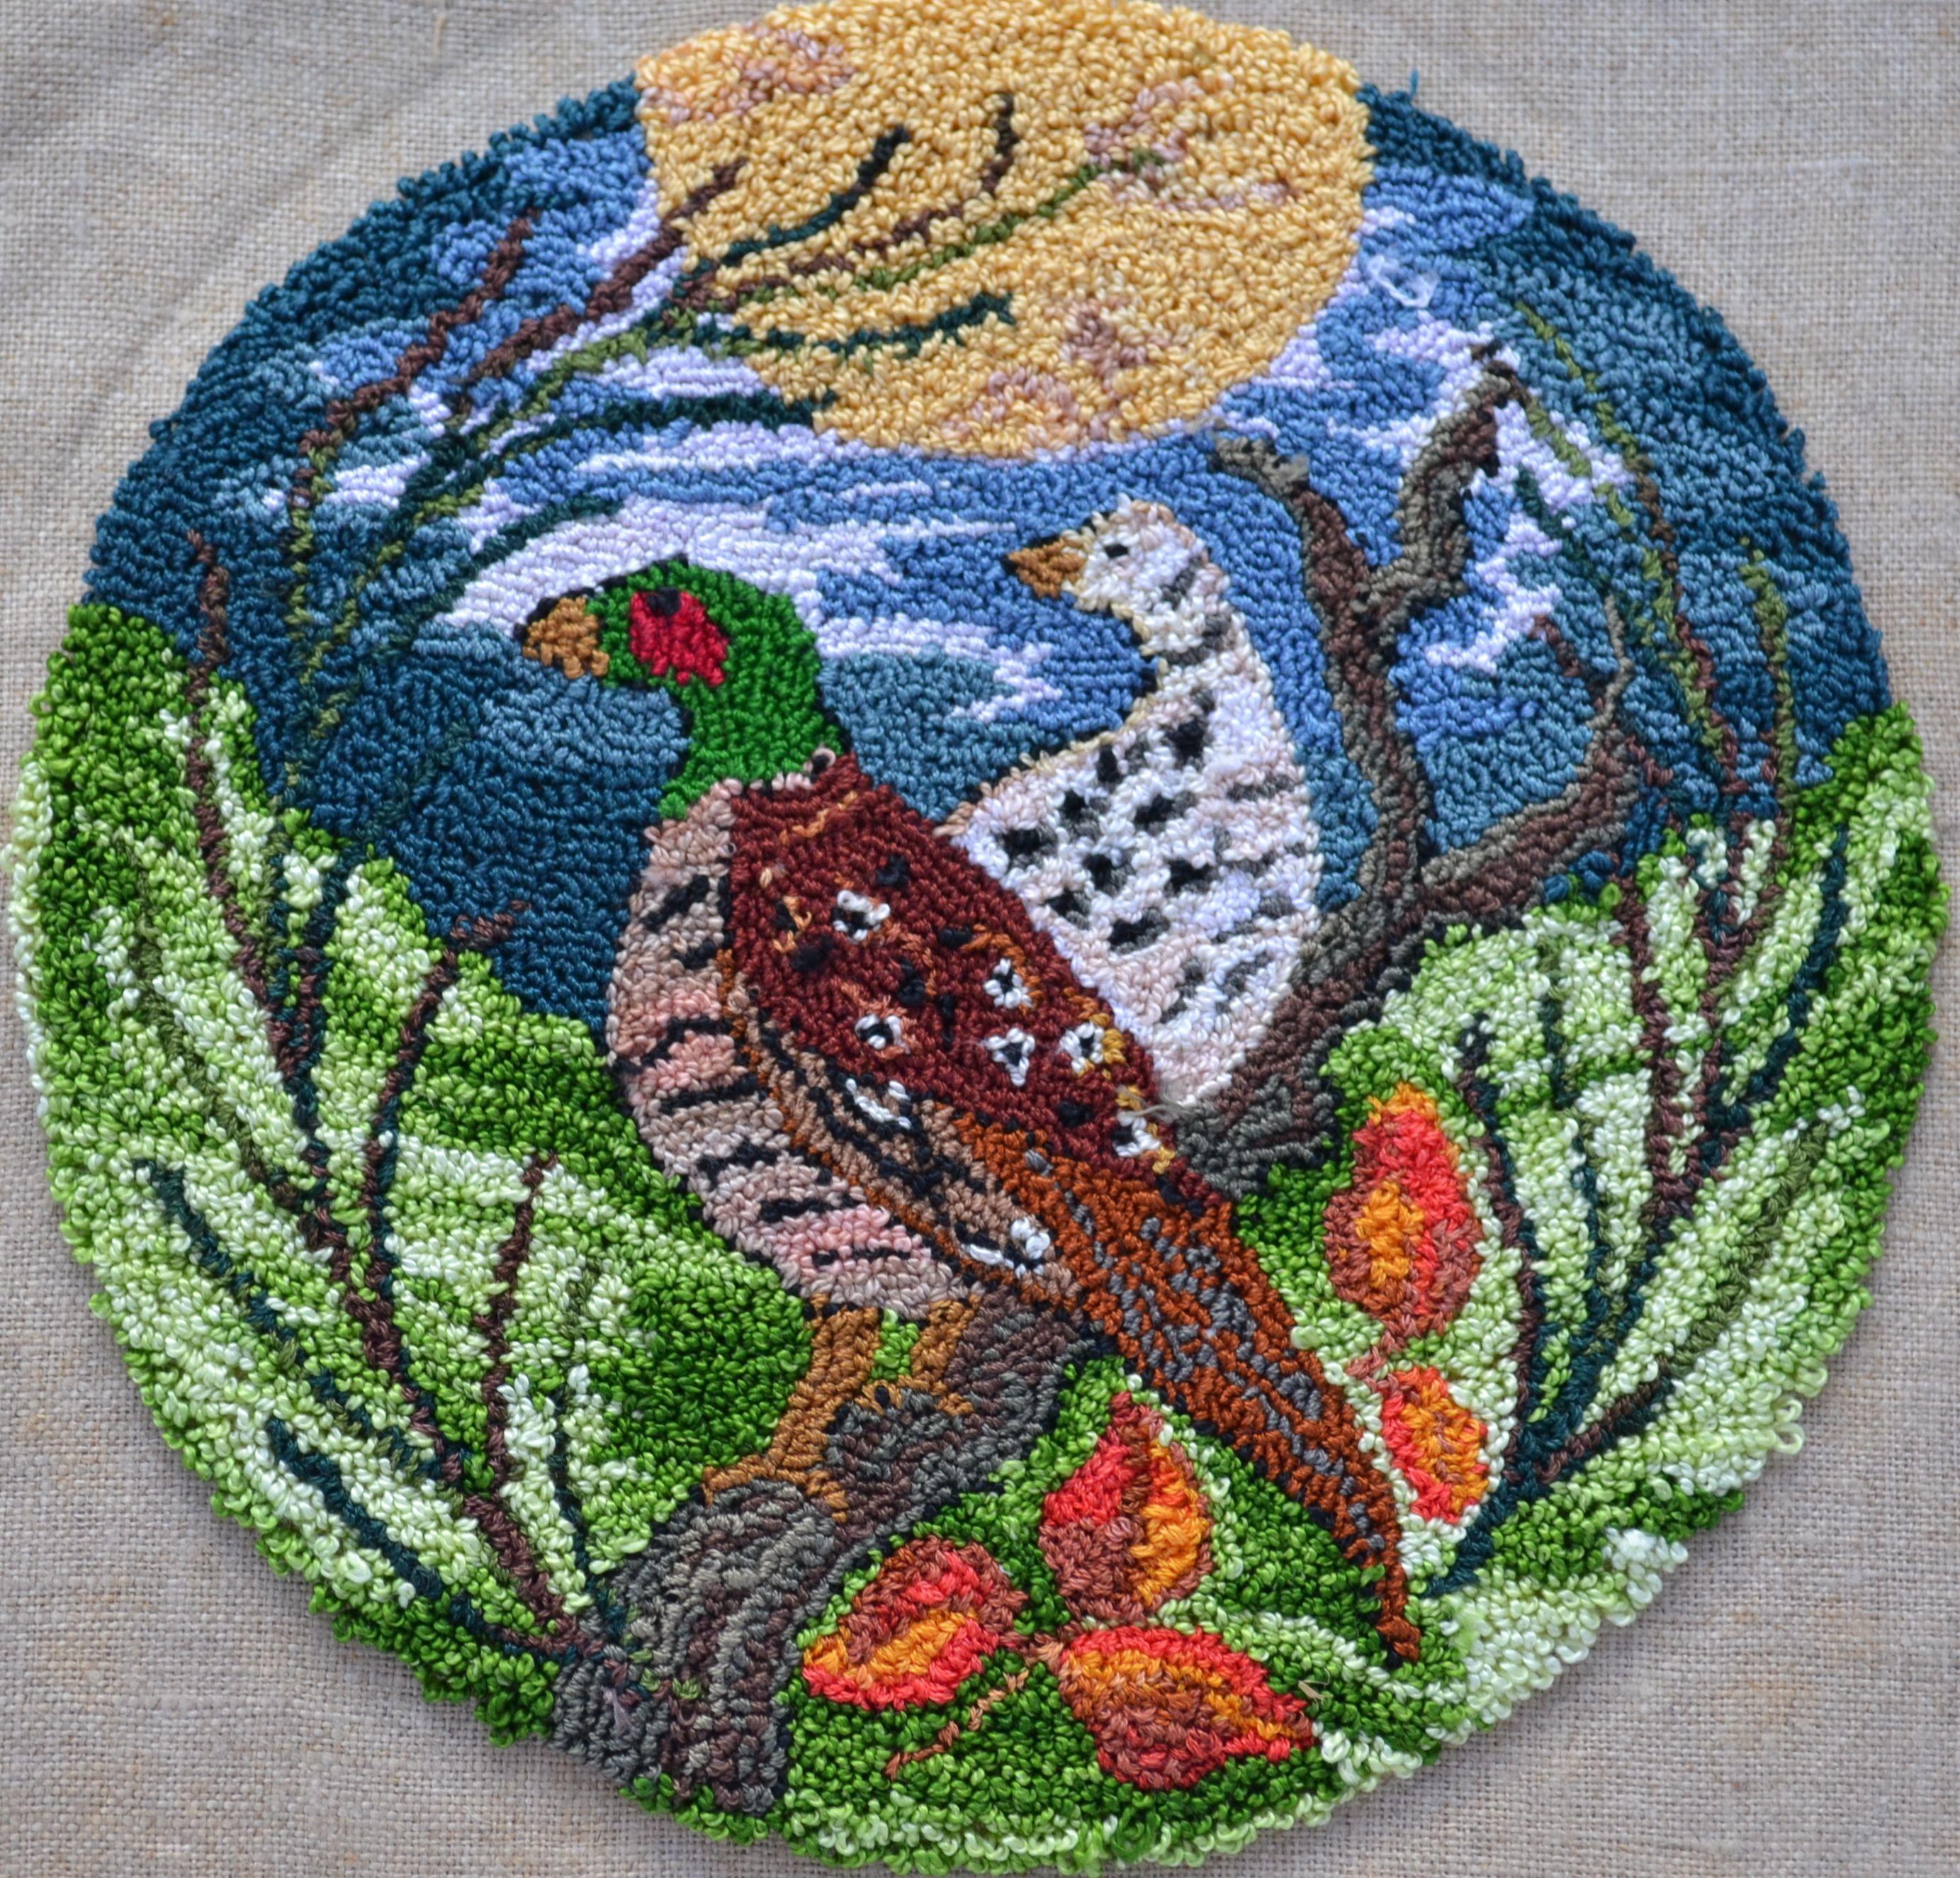 """Highland pheasants"" Original needlepunch worked for the 2015 Robert Burns festival, Camperdown Victoria Aus."